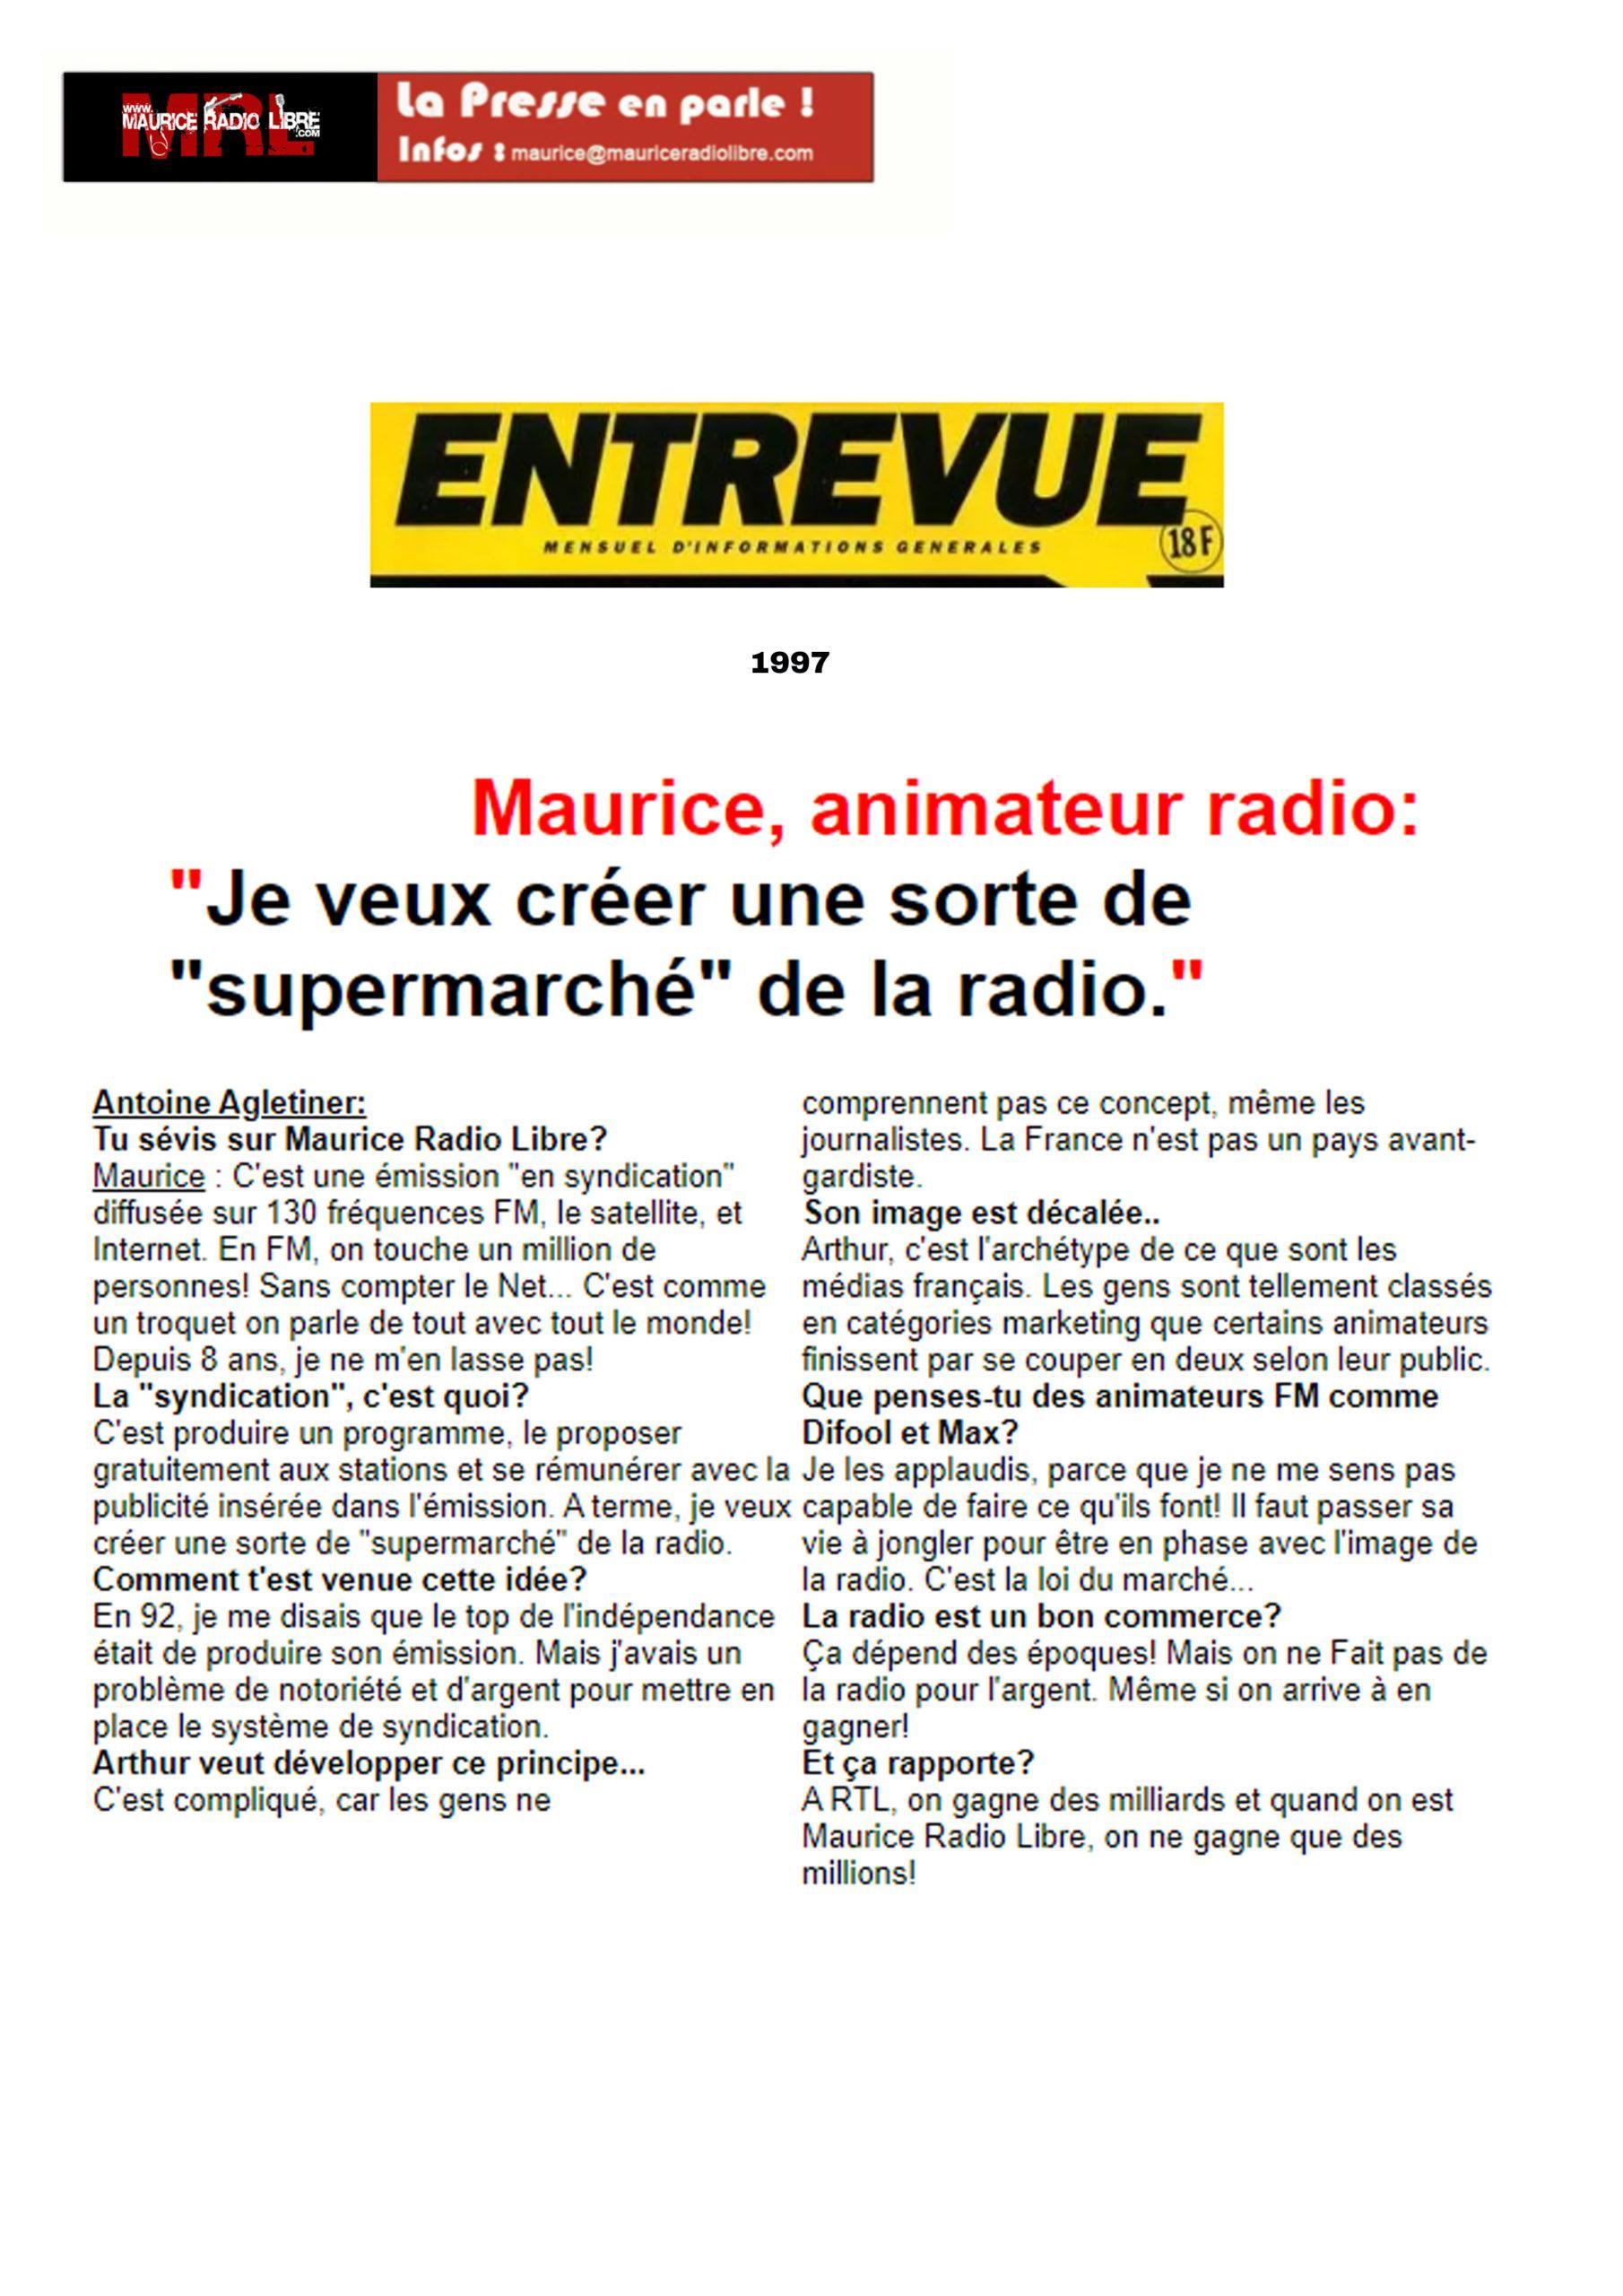 vignette Entrevue Maurice, animateur radio - 1997